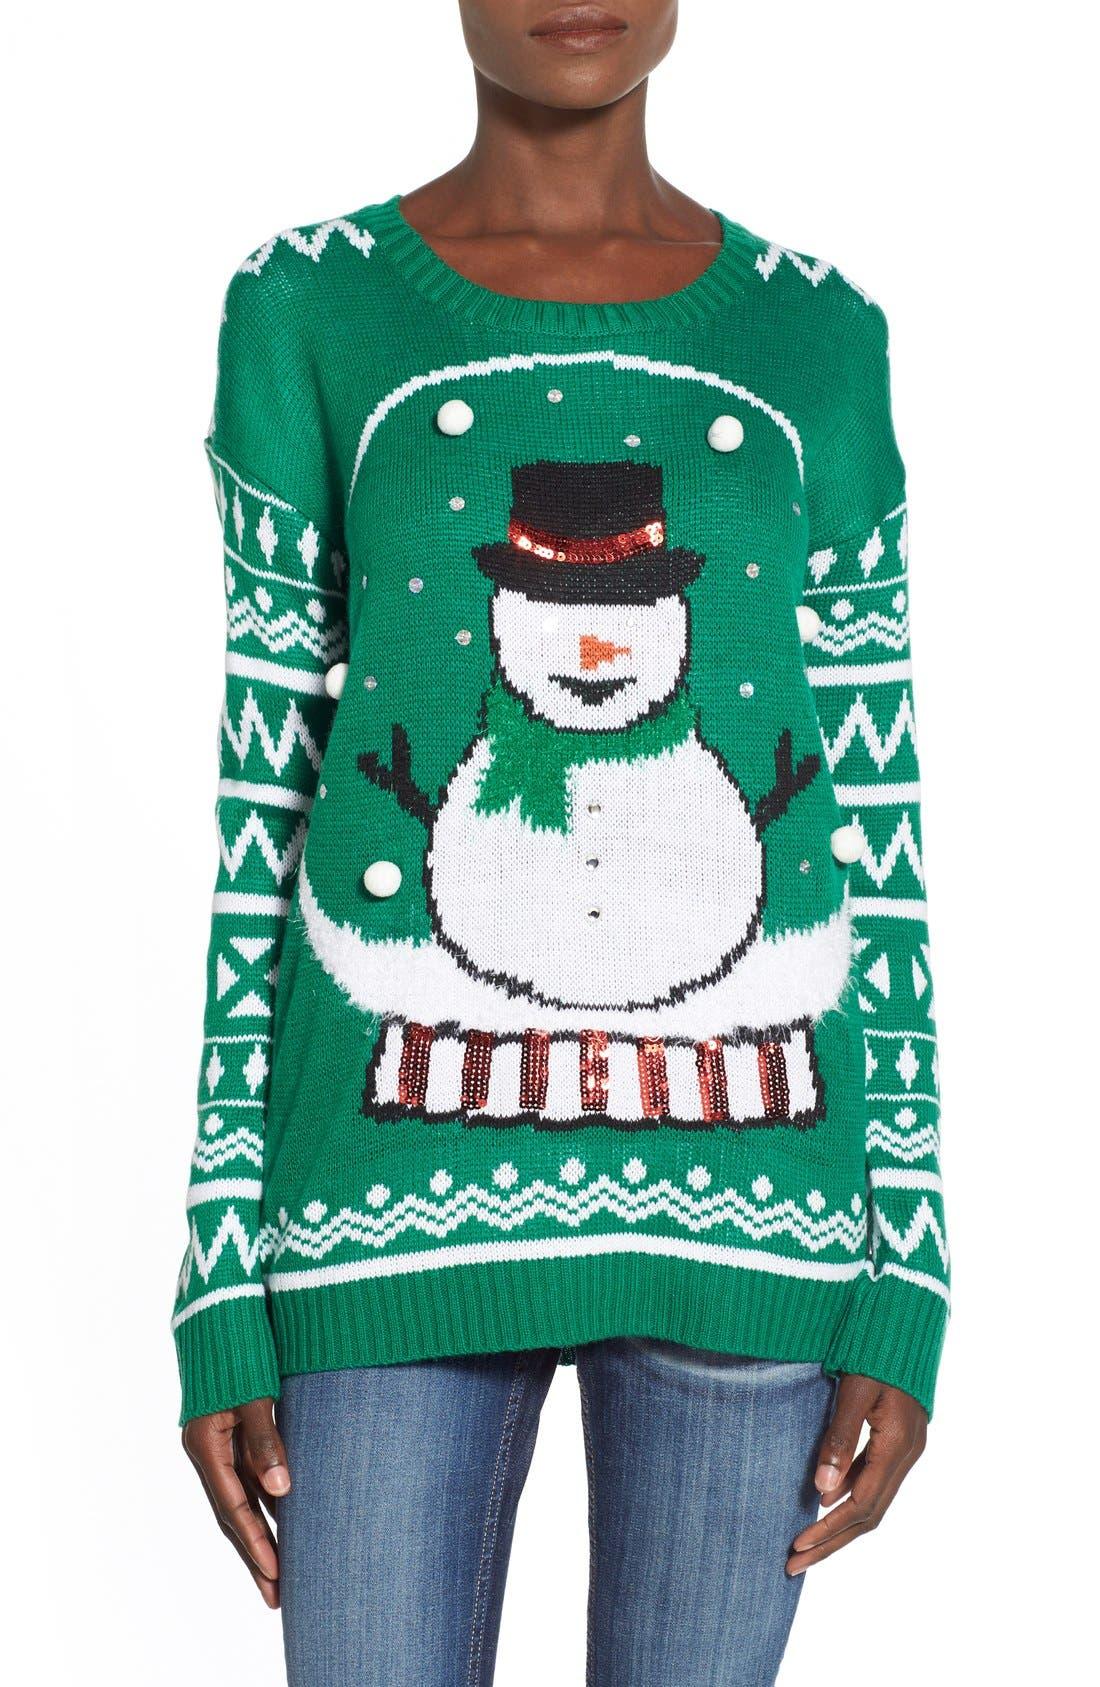 Main Image - Derek Heart 'Snow Globe' Musical Christmas Sweater